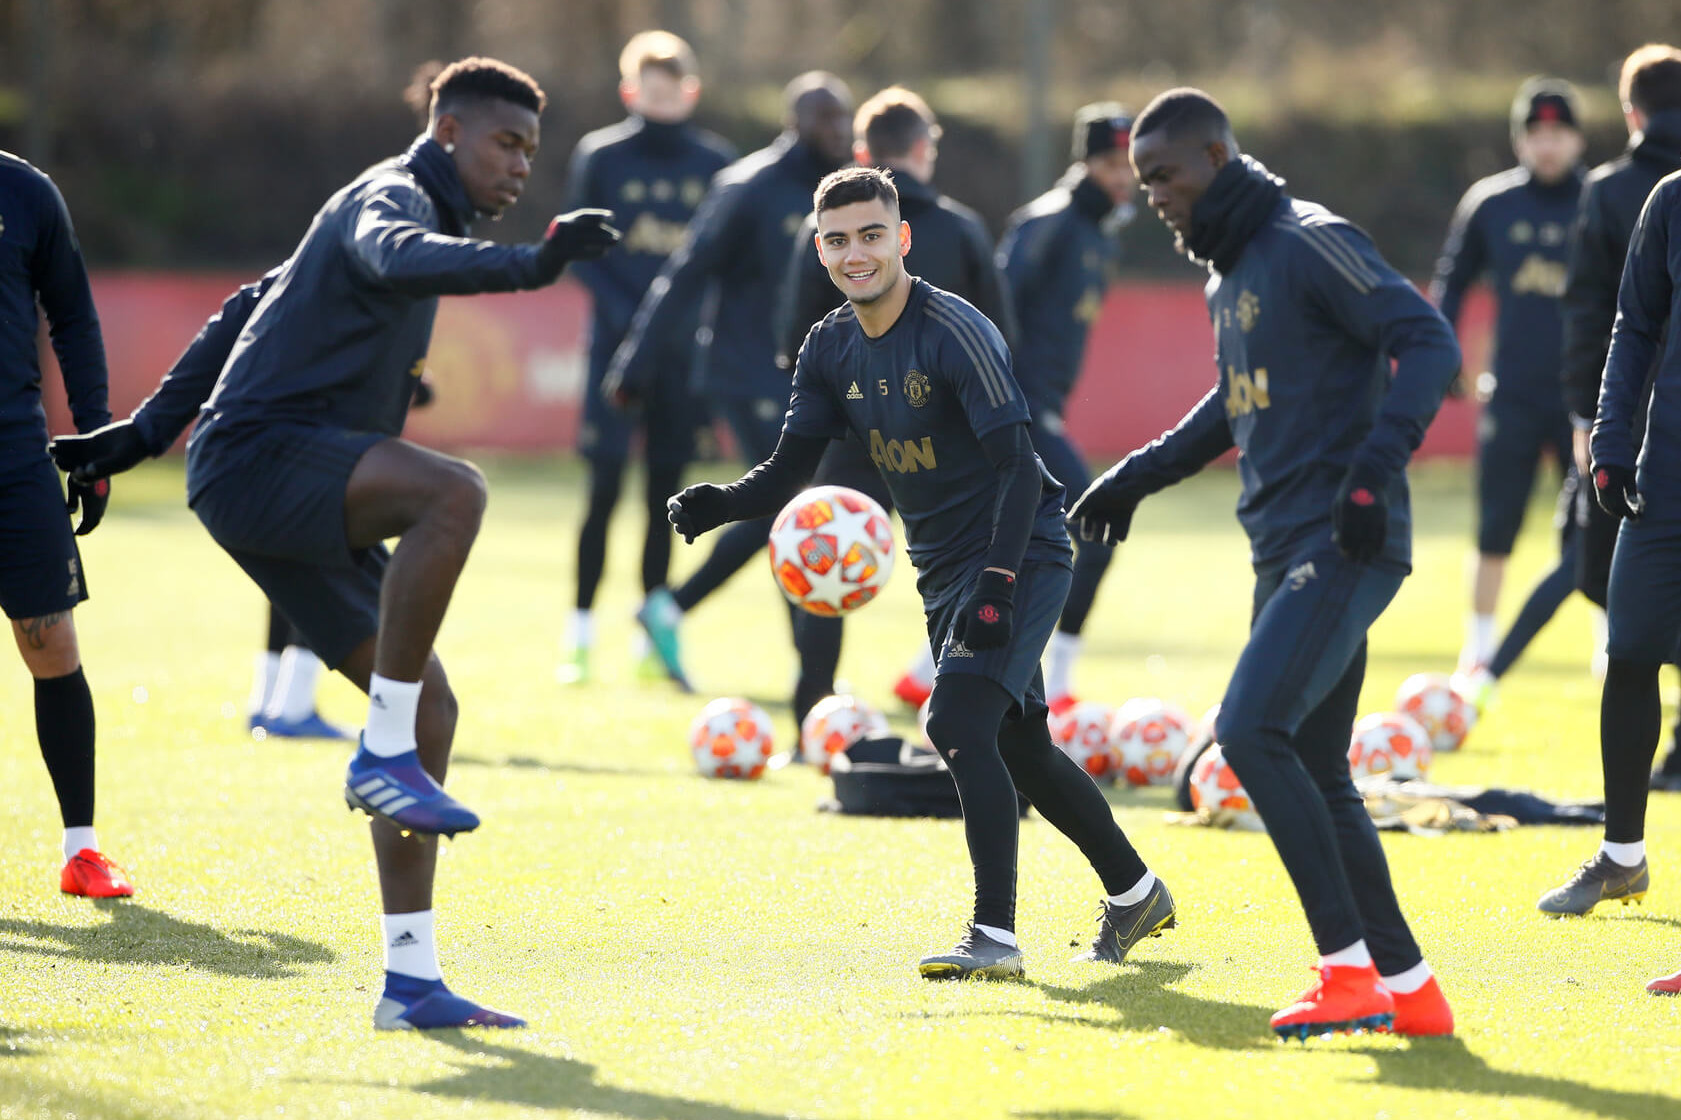 Paul Pogba, Andreas Pereira, Eric Bailly, Manchester United, England